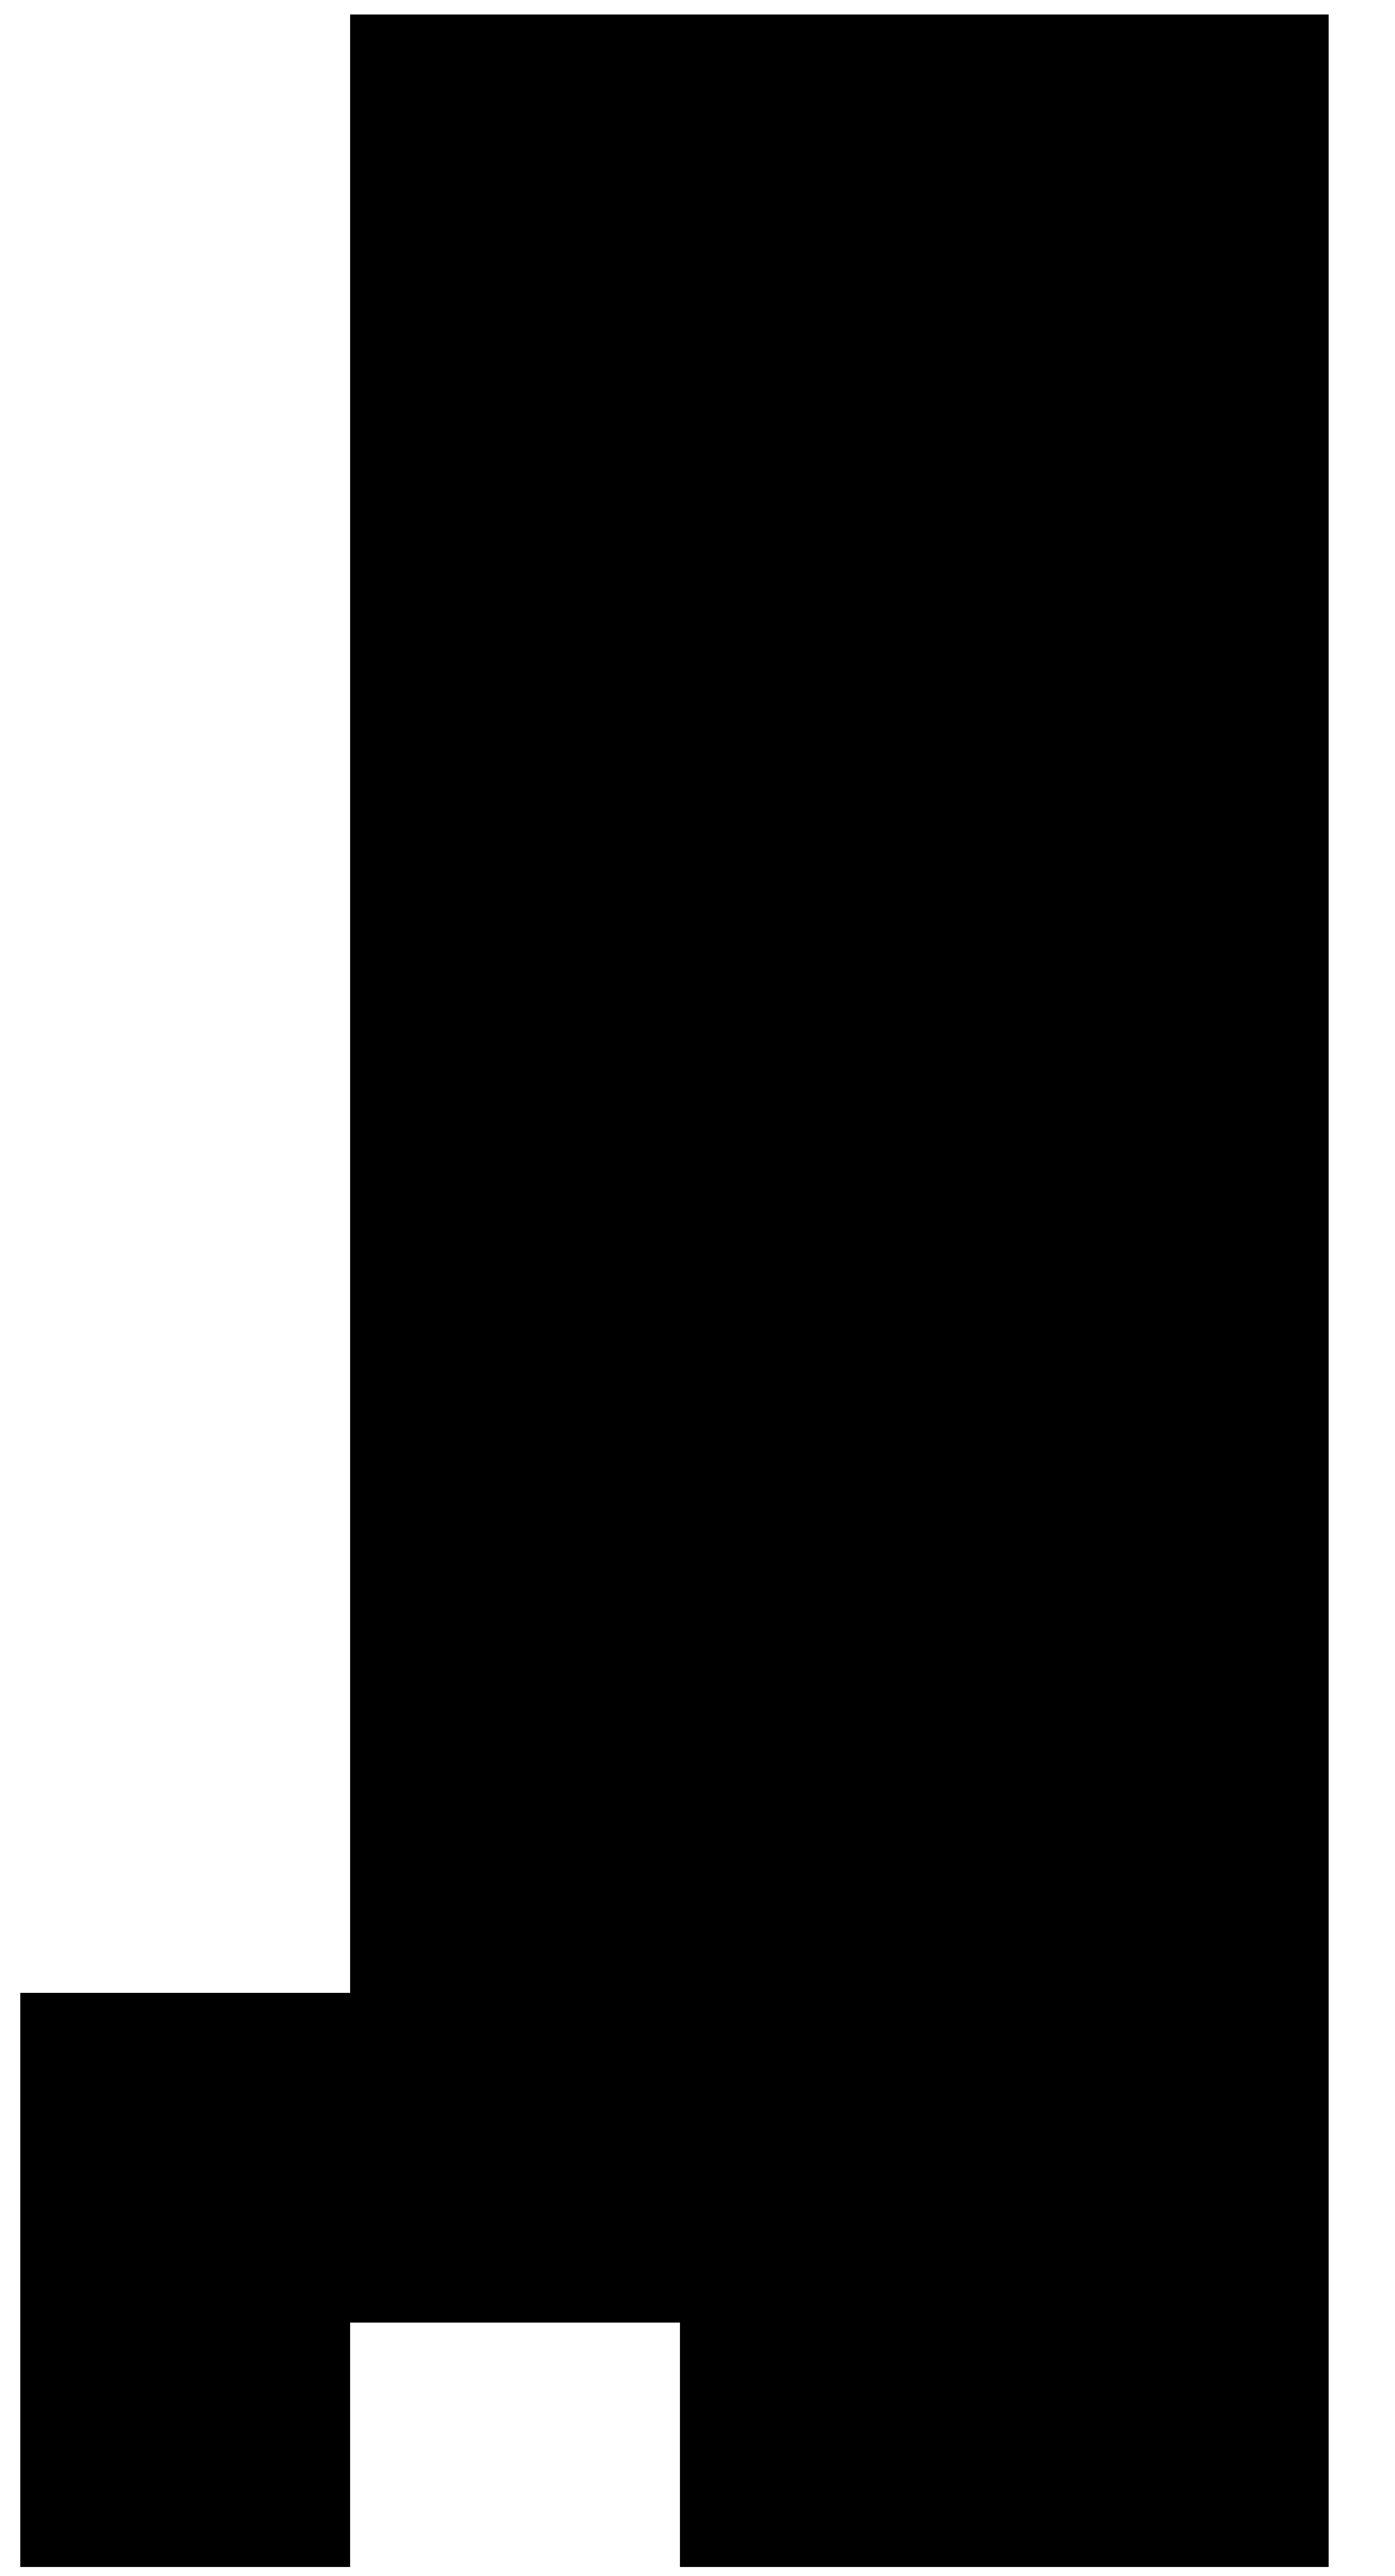 4331x8000 Golf Player Silhouette Png Clip Art Imageu200b Gallery Yopriceville